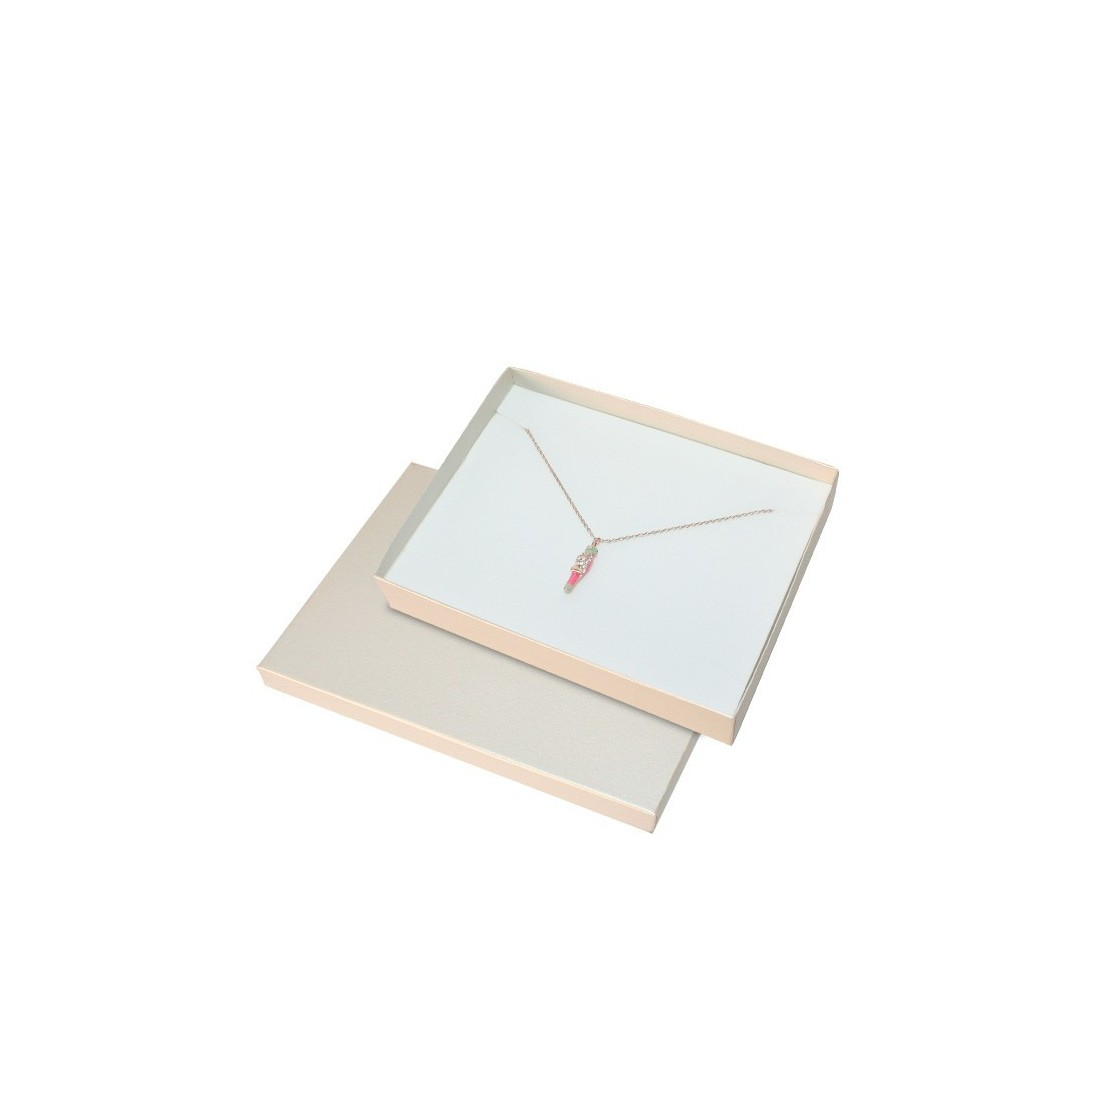 Cordoba Metallic Jewellery Box, Necklace